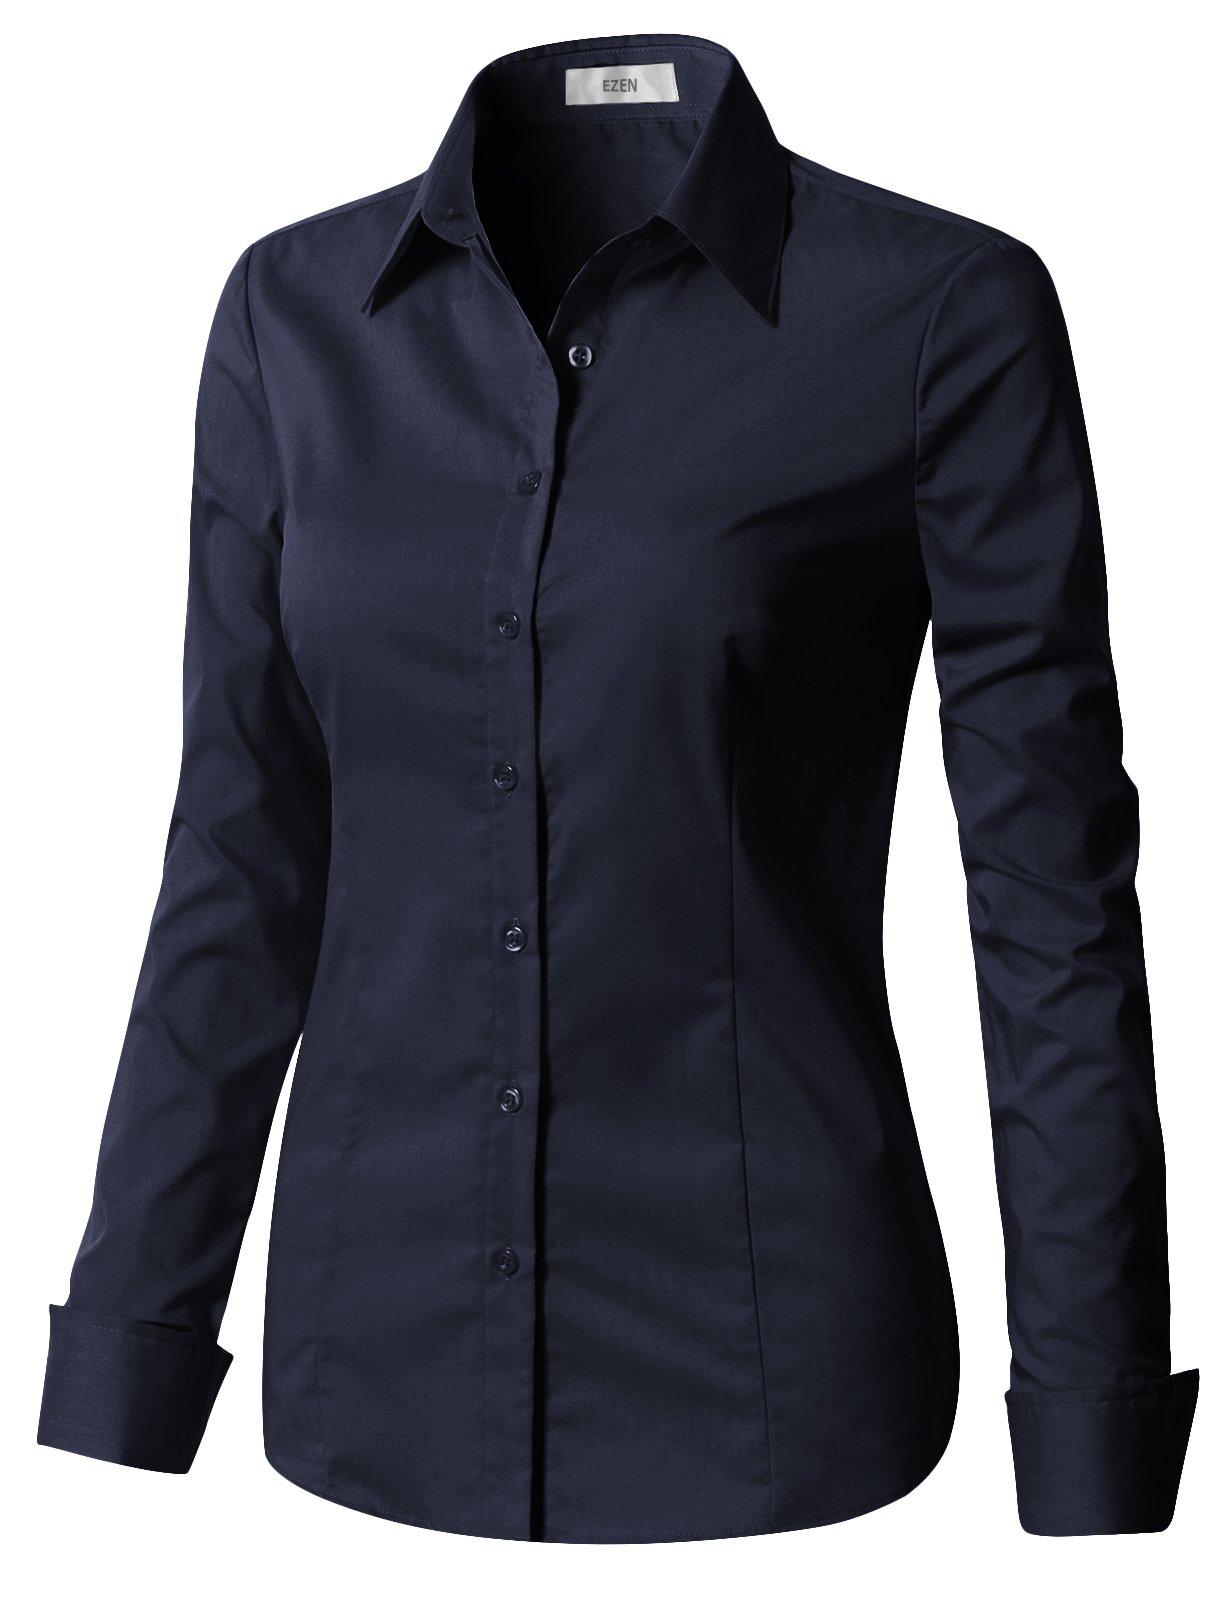 EZEN Womens Business Long Sleeve Button Down Collared Shirt Navy XX-Large